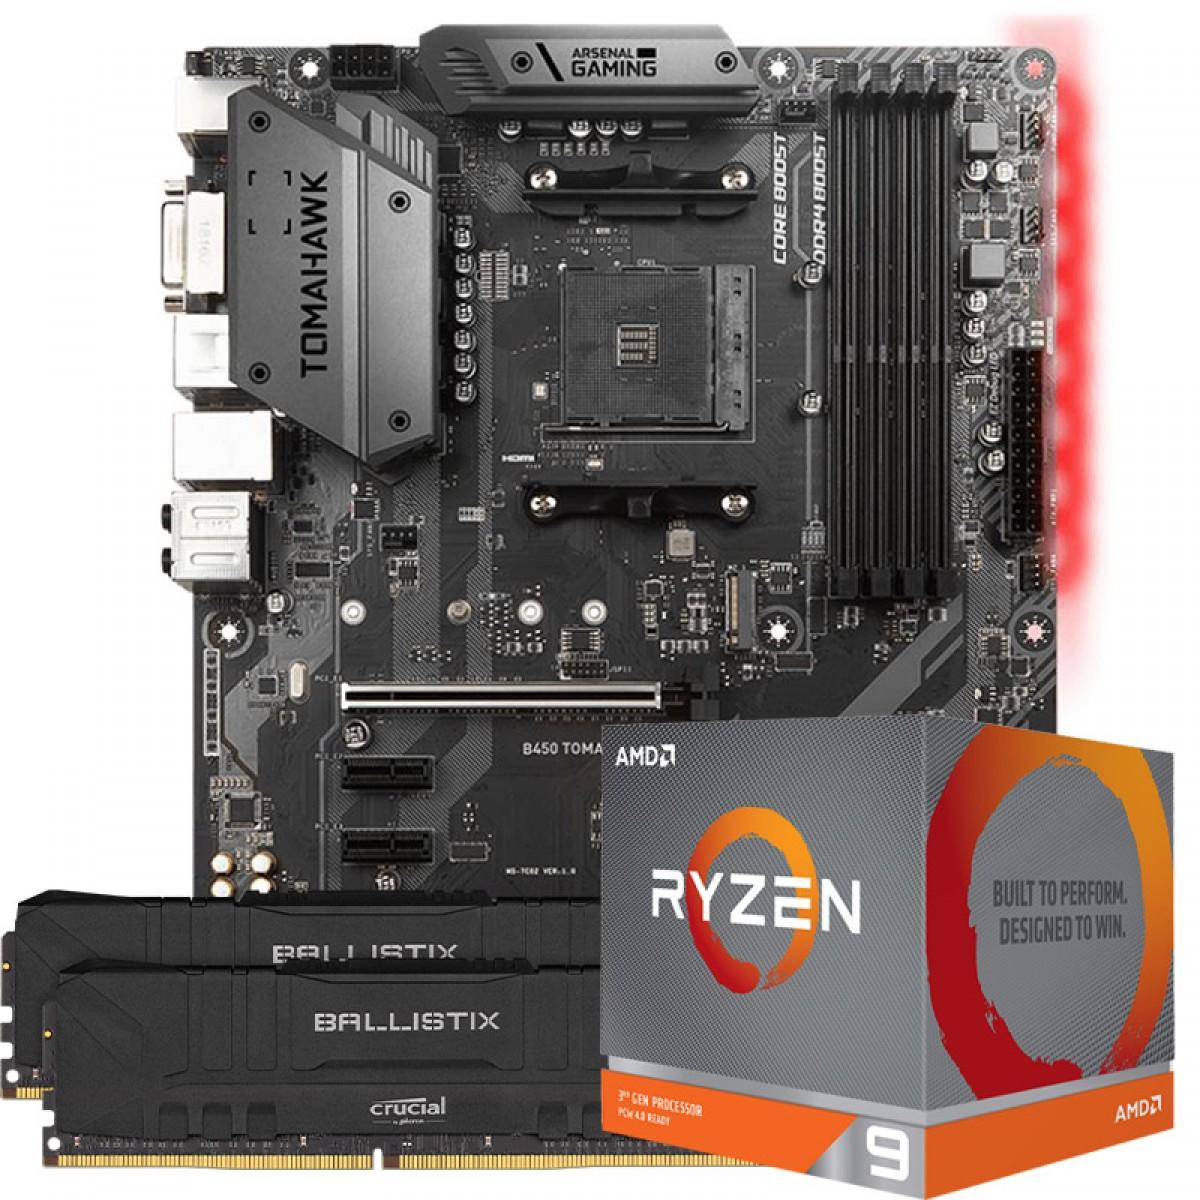 Kit Upgrade Placa Mãe MSI B450 Tomahawk AMD AM4 + Processador AMD Ryzen 9 3900x 3.8GHz + Memória DDR4 16GB (2X8GB) 3000MHz